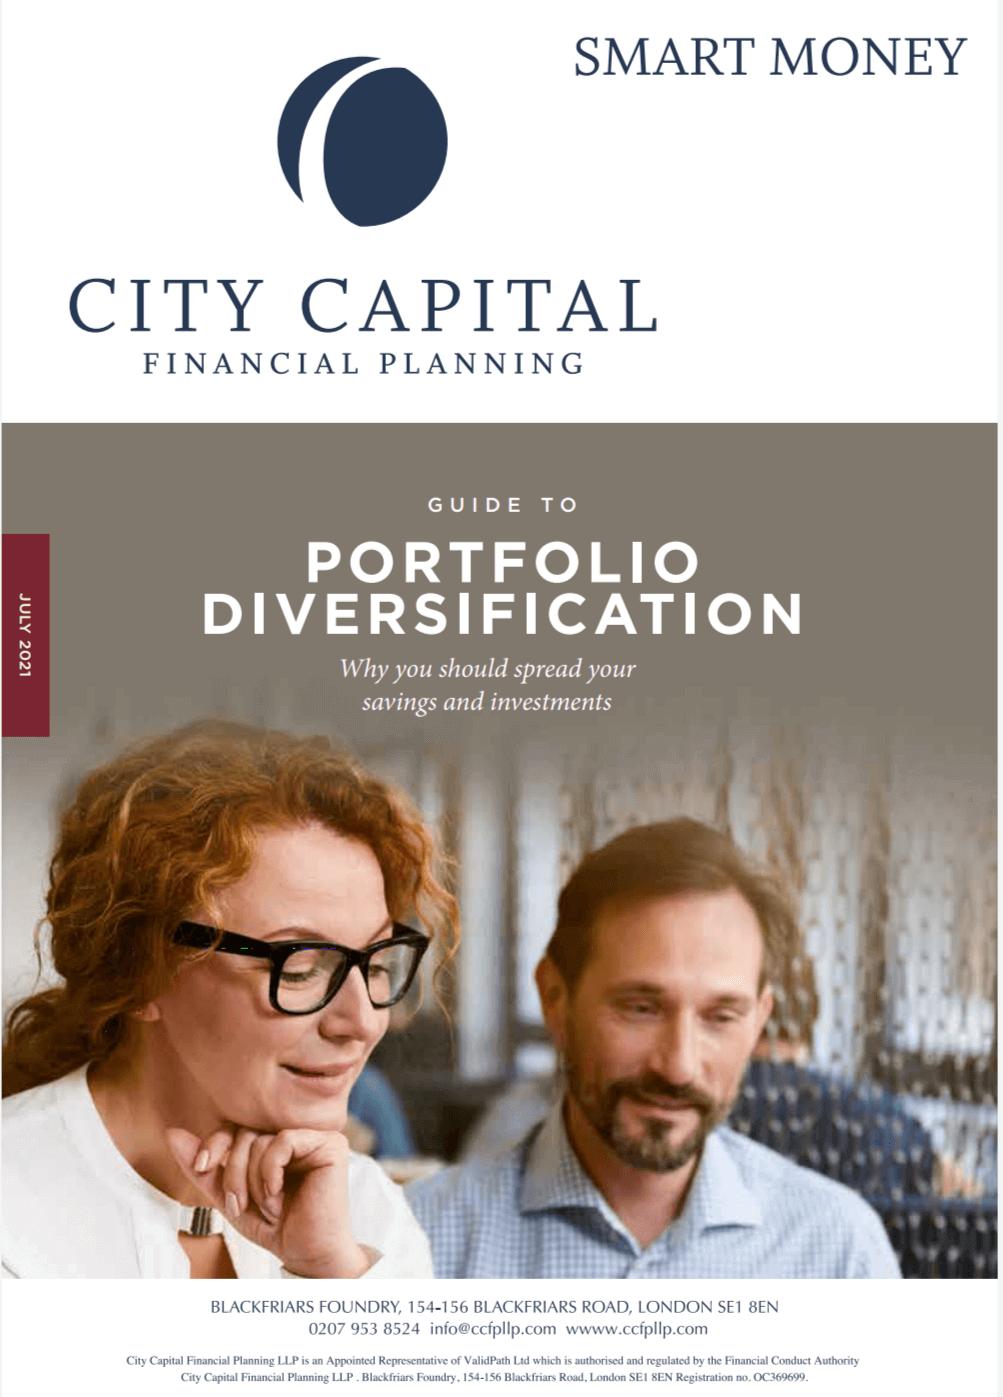 A Guide to Portfolio Diversification